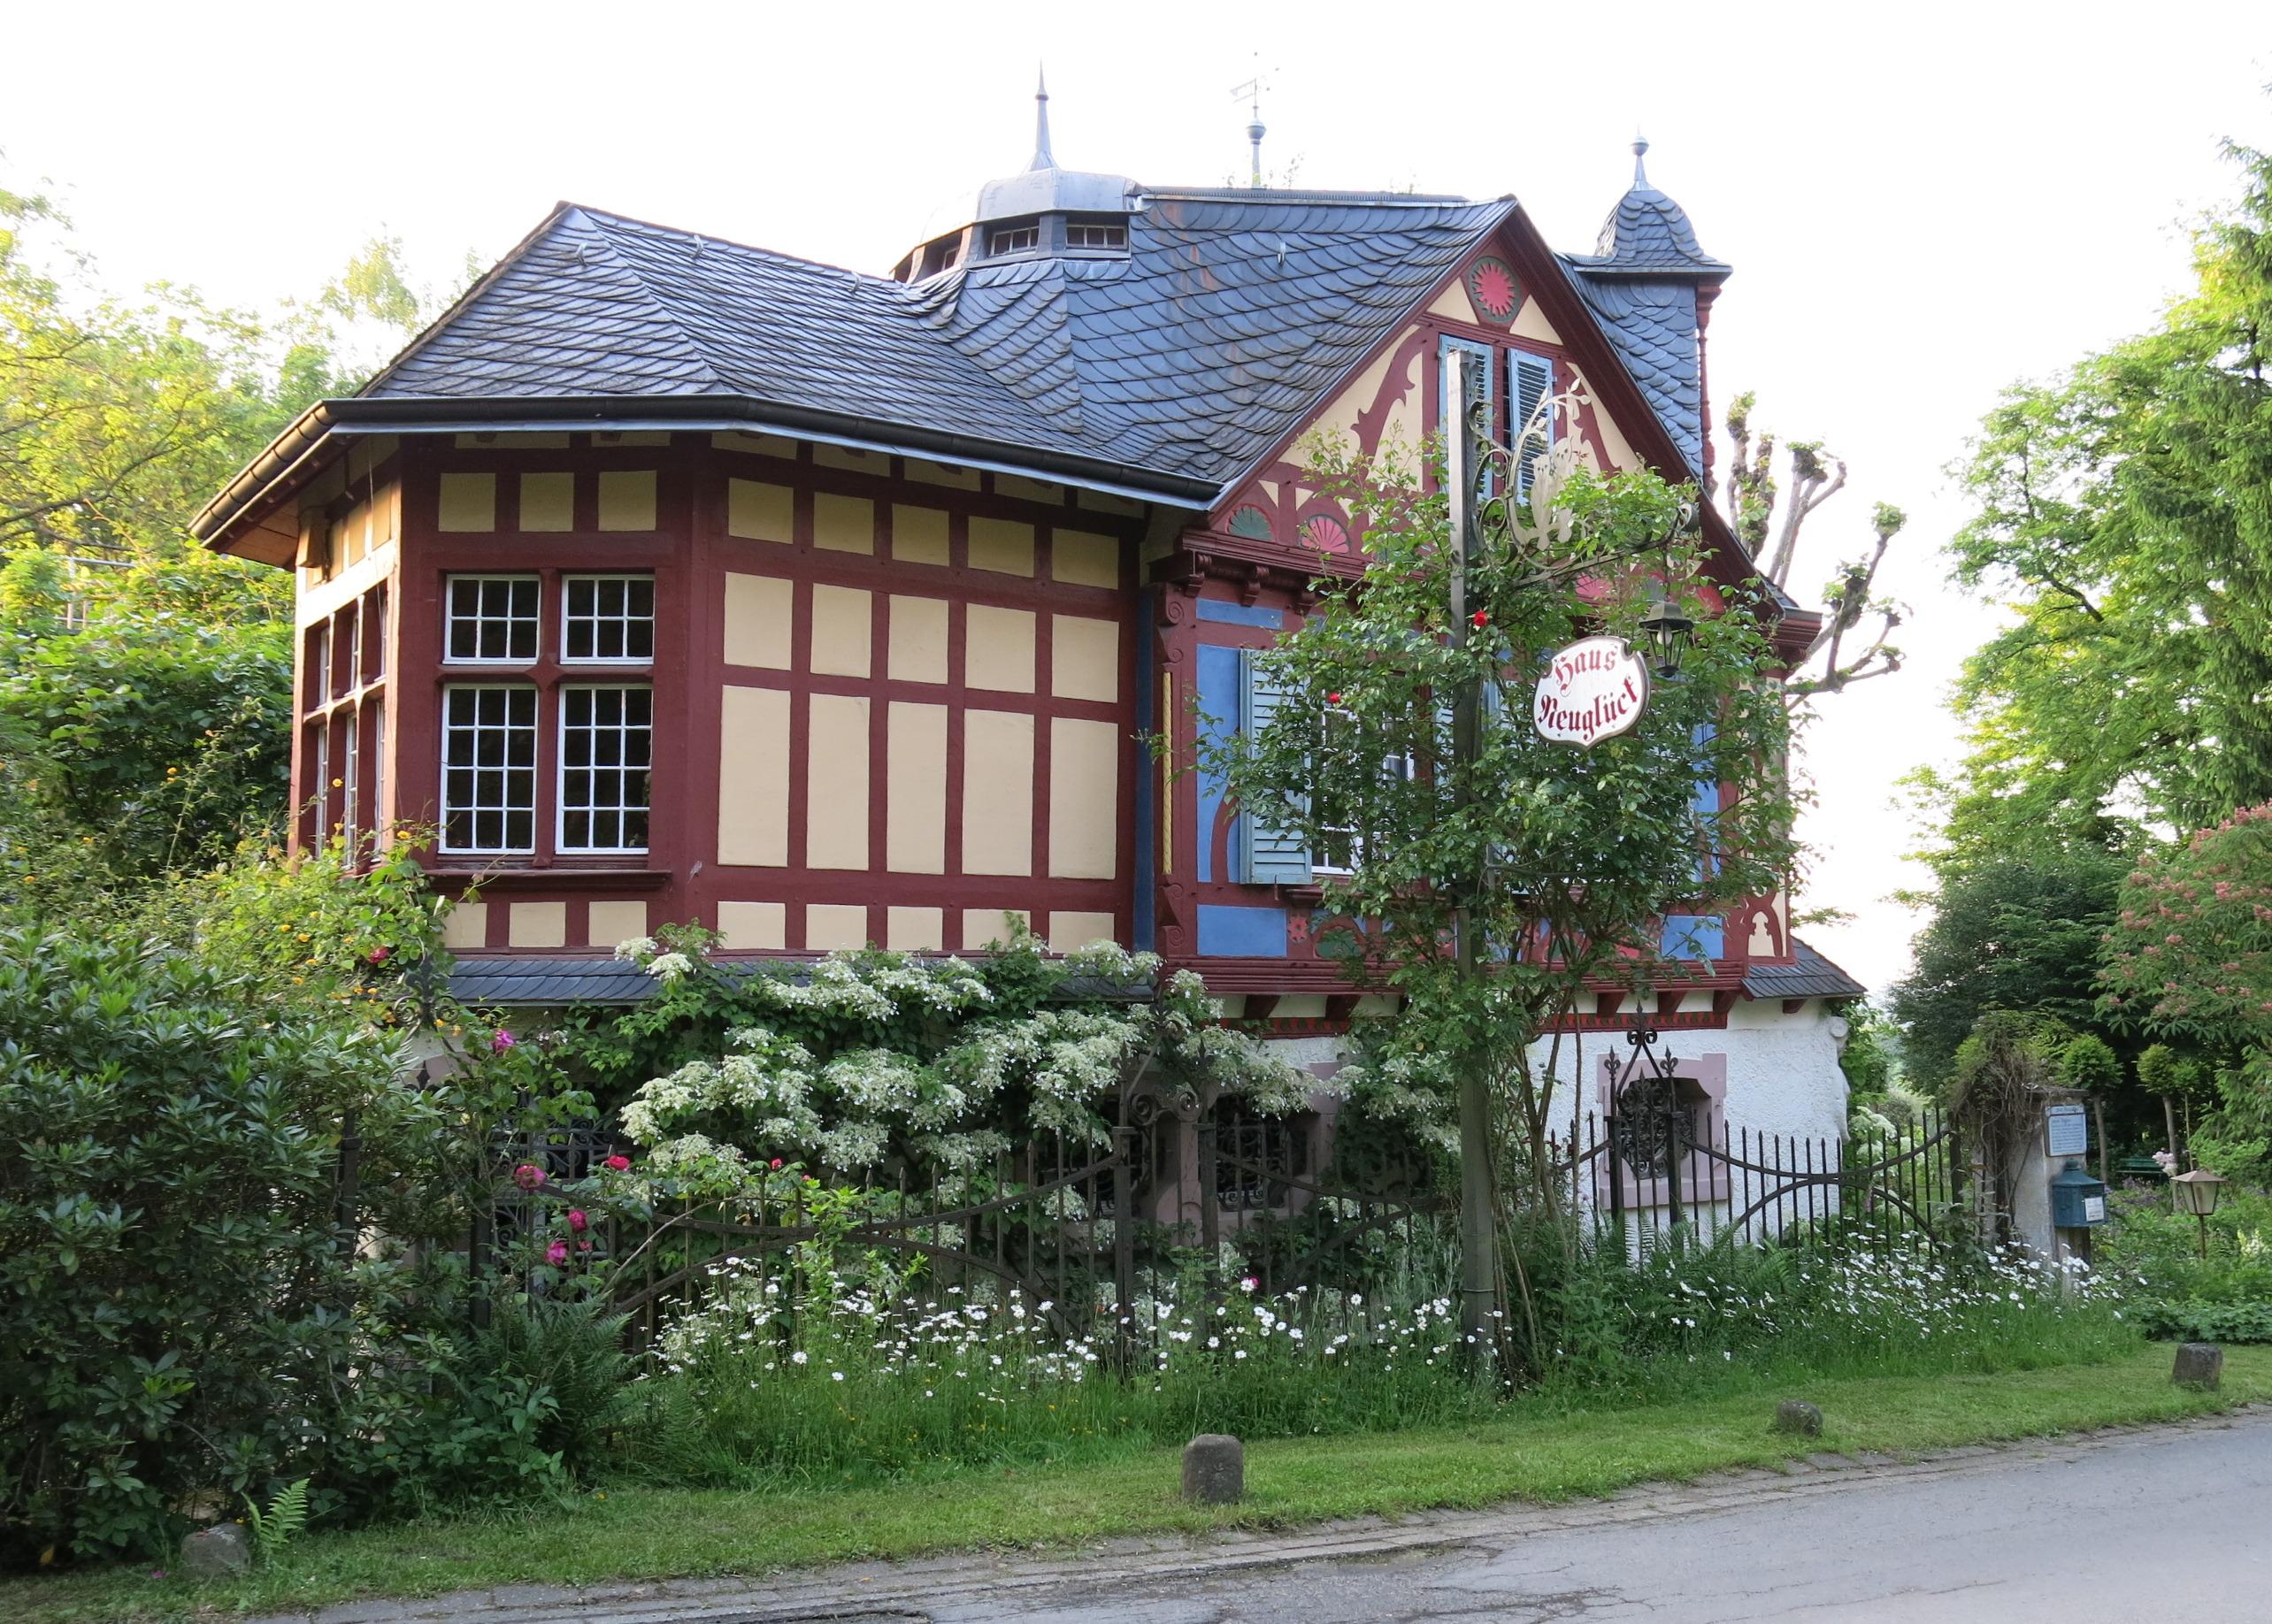 Haus Neuglück in Königswinter